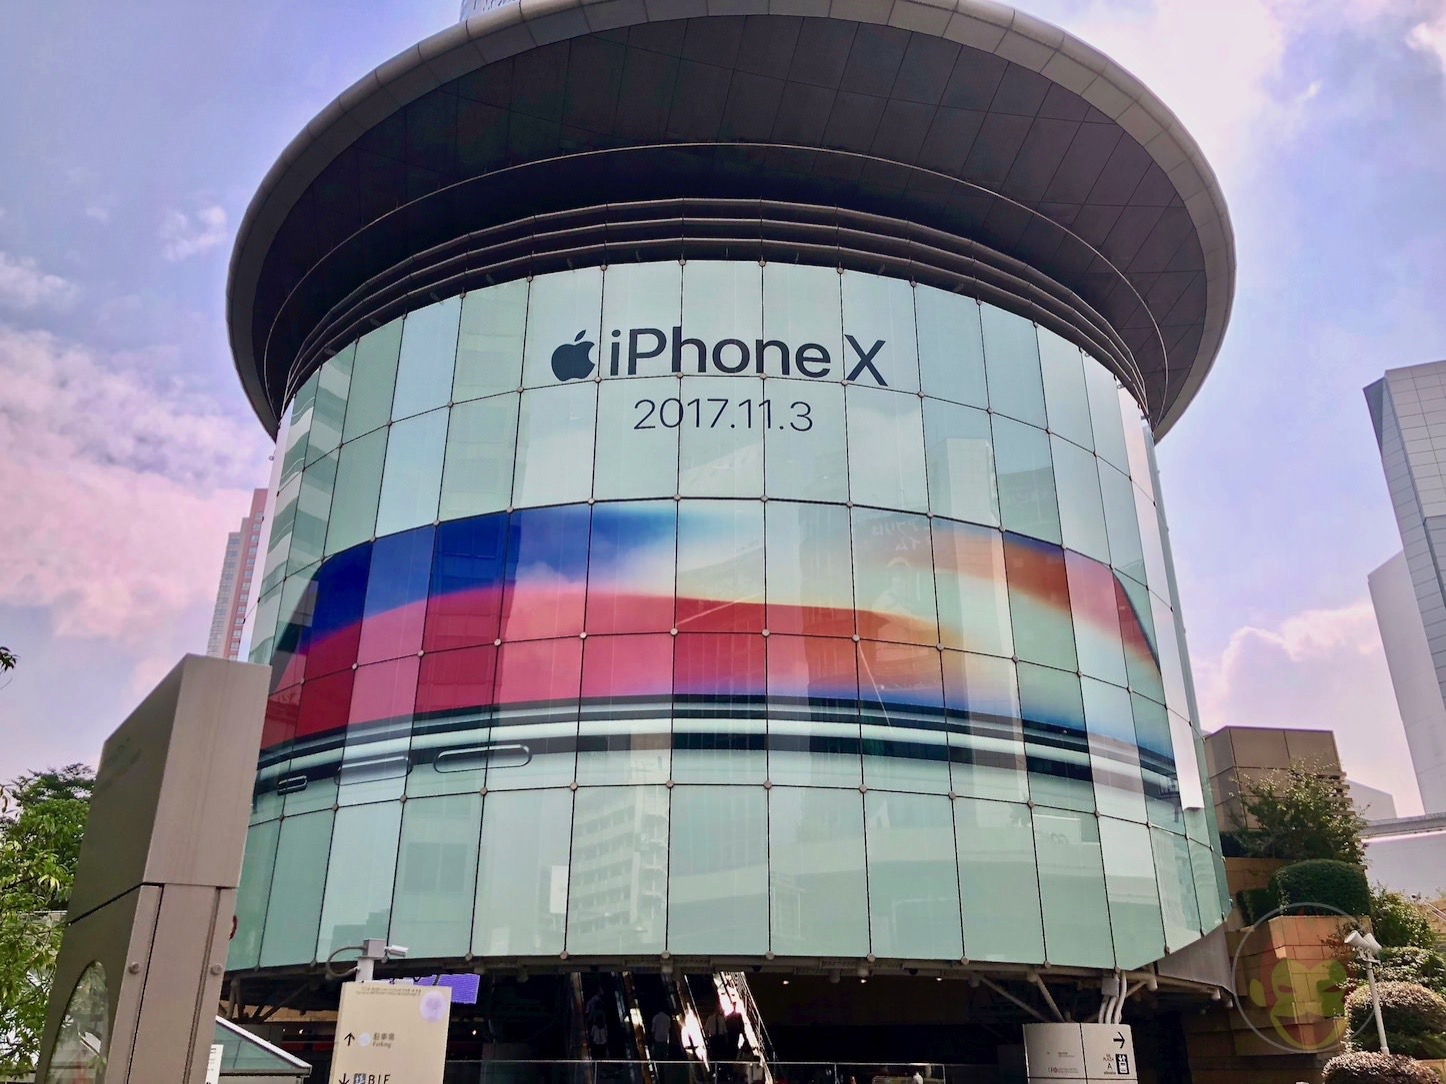 iPhoneX-Coming-Soon-at-Roppongi.jpg